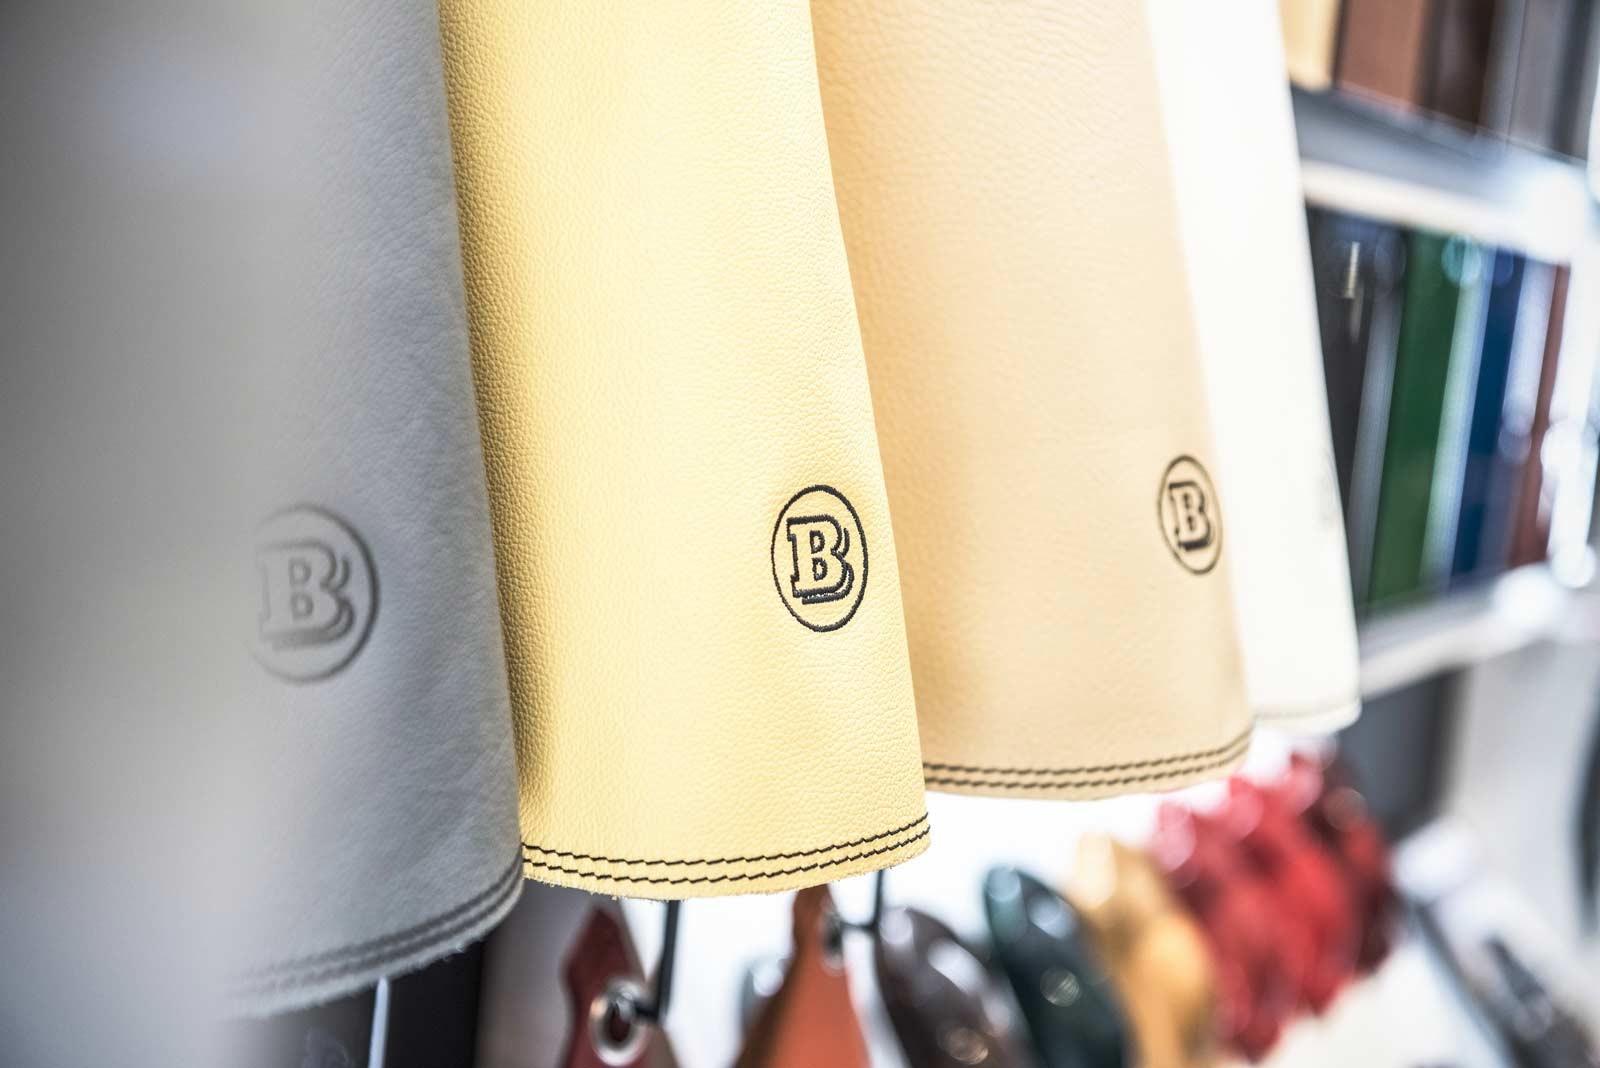 Brabus-Sunseeker-flagship-store-Dusseldorf_21